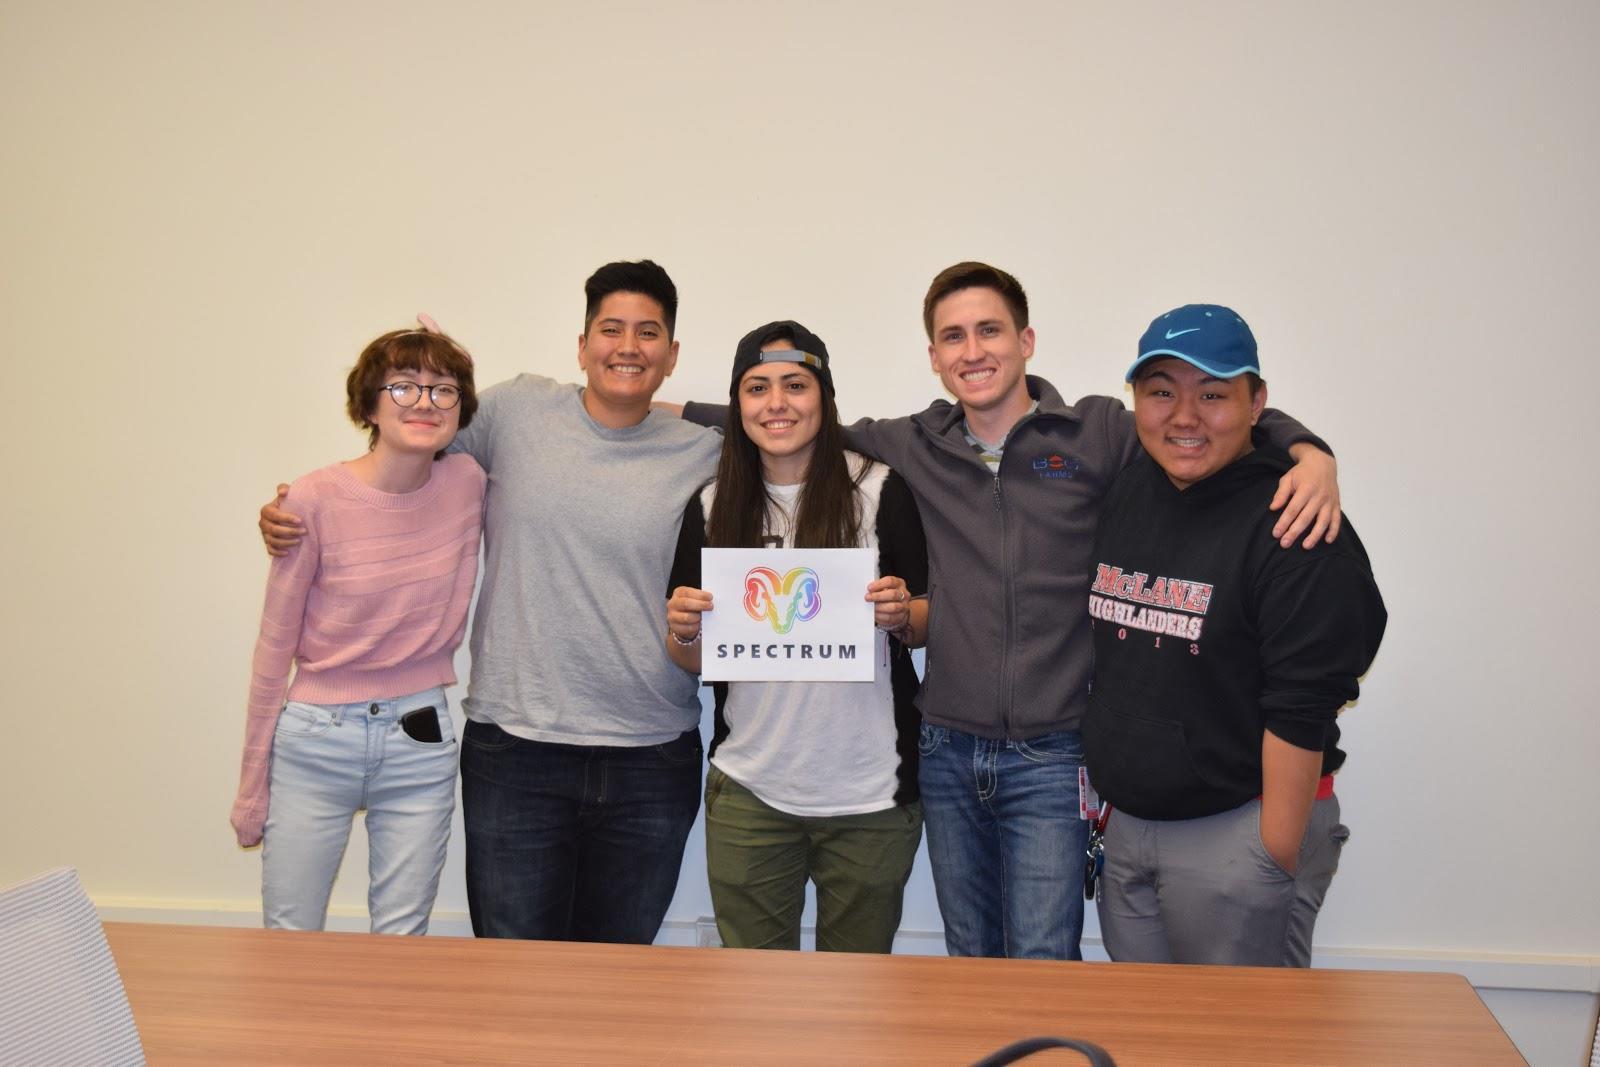 LGBTQ Spectrum Club members from left to right: Treasurer Adri Almaguer, Vice President Kristen Lopez, President Cody Sedano and Secretary Roger Her. March 14, 2016.